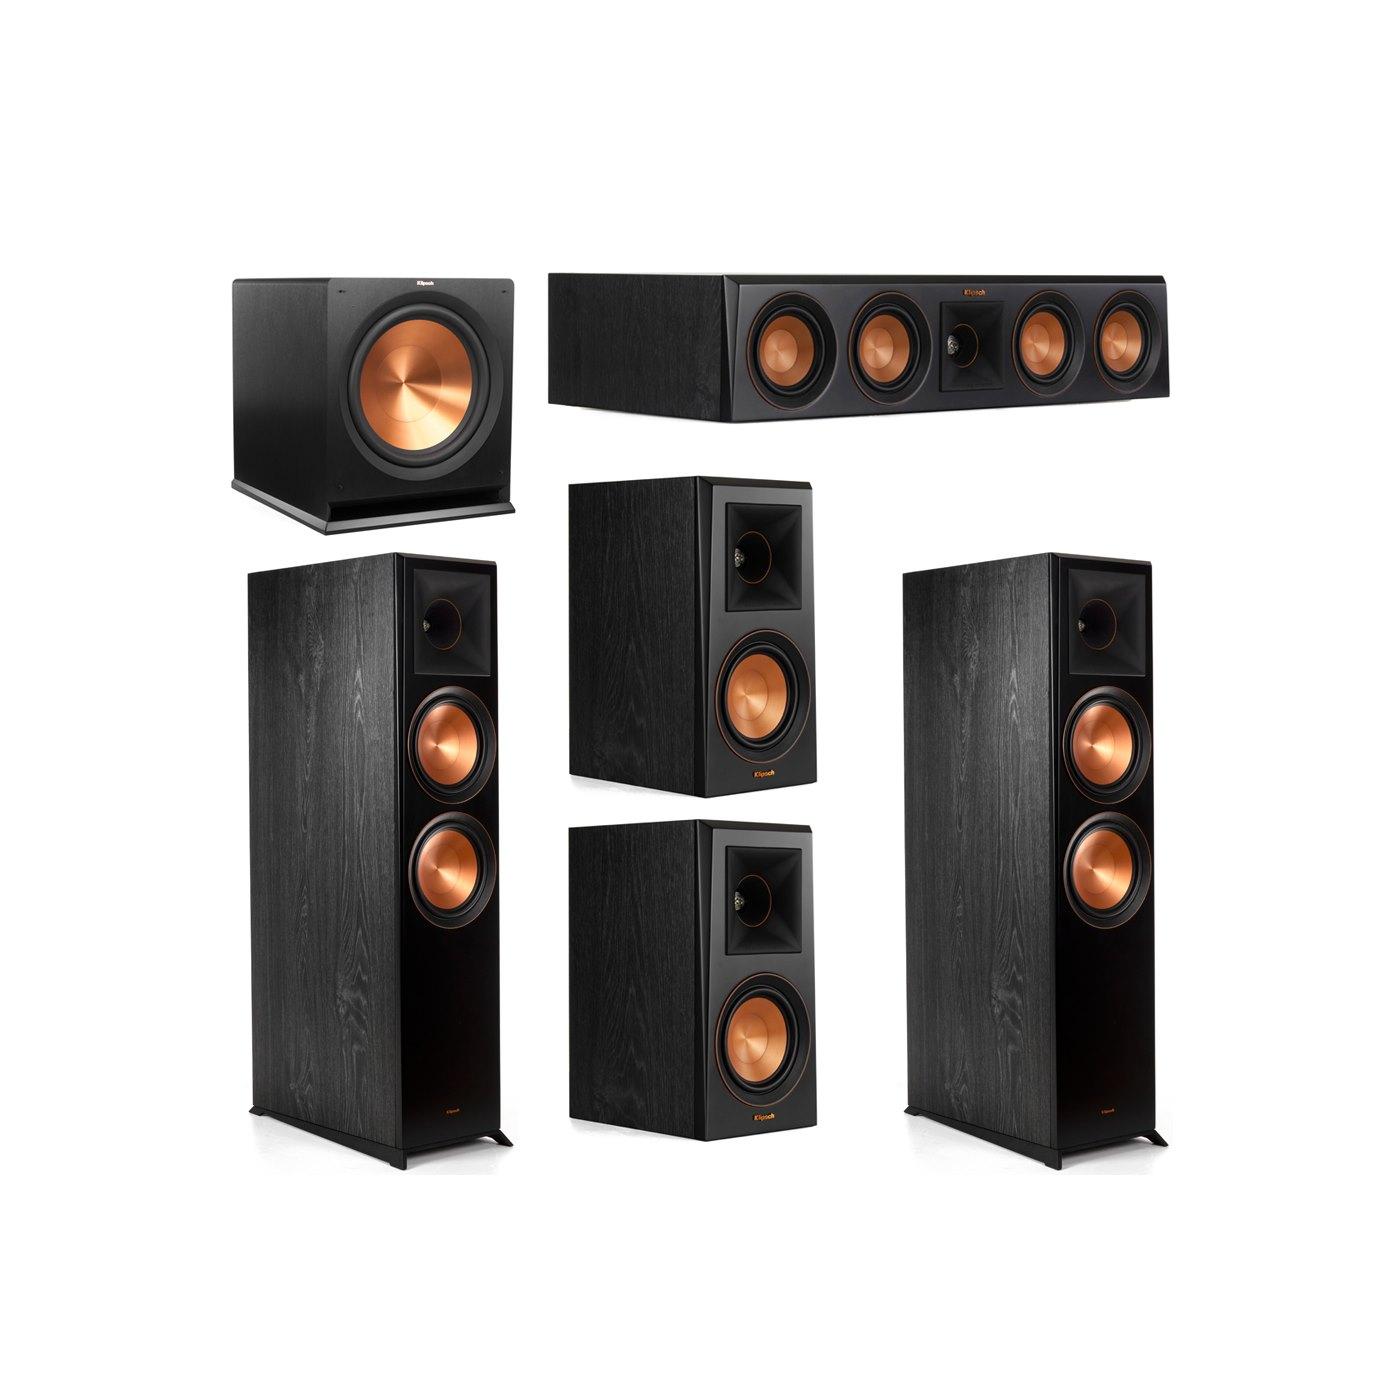 Klipsch 5.1 System with 2 RP-8000F Floorstanding Speakers, 1 Klipsch RP-404C Center Speaker, 2 Klipsch RP-500M Surround Speakers, 1 Klipsch R-115SW Subwoofer